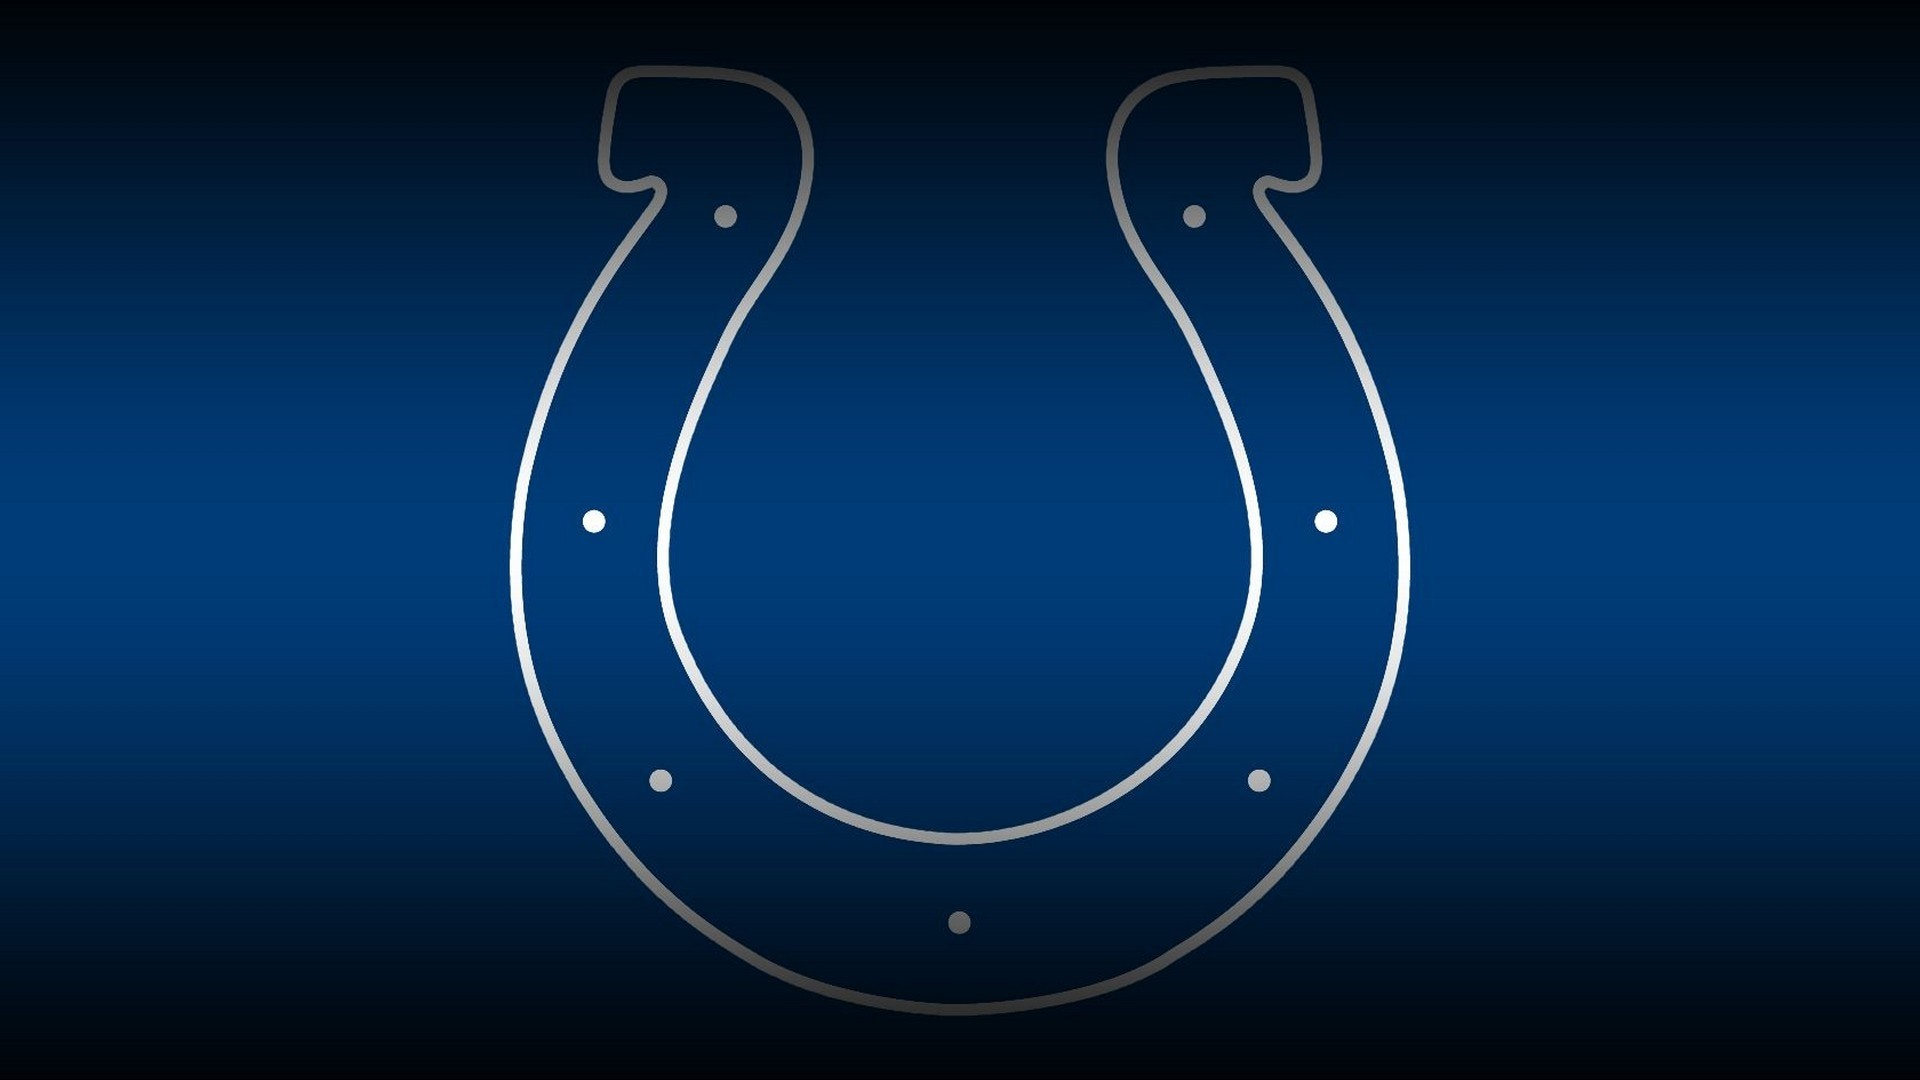 Colts Free Wallpaper